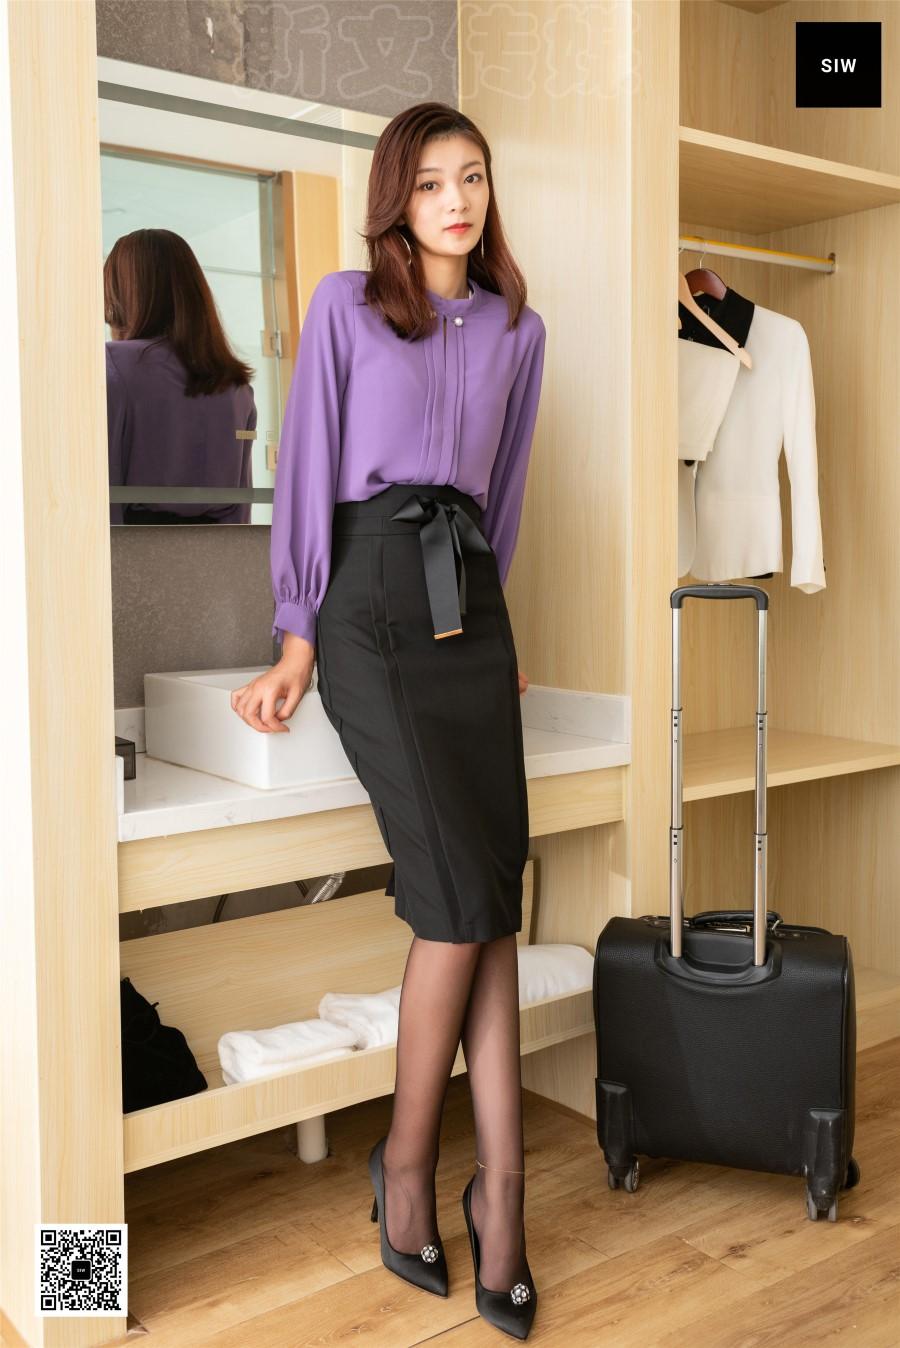 [SIW斯文传媒]VOL.084 嘉慧 长袖立领茄紫色蝴蝶结淑女套裙